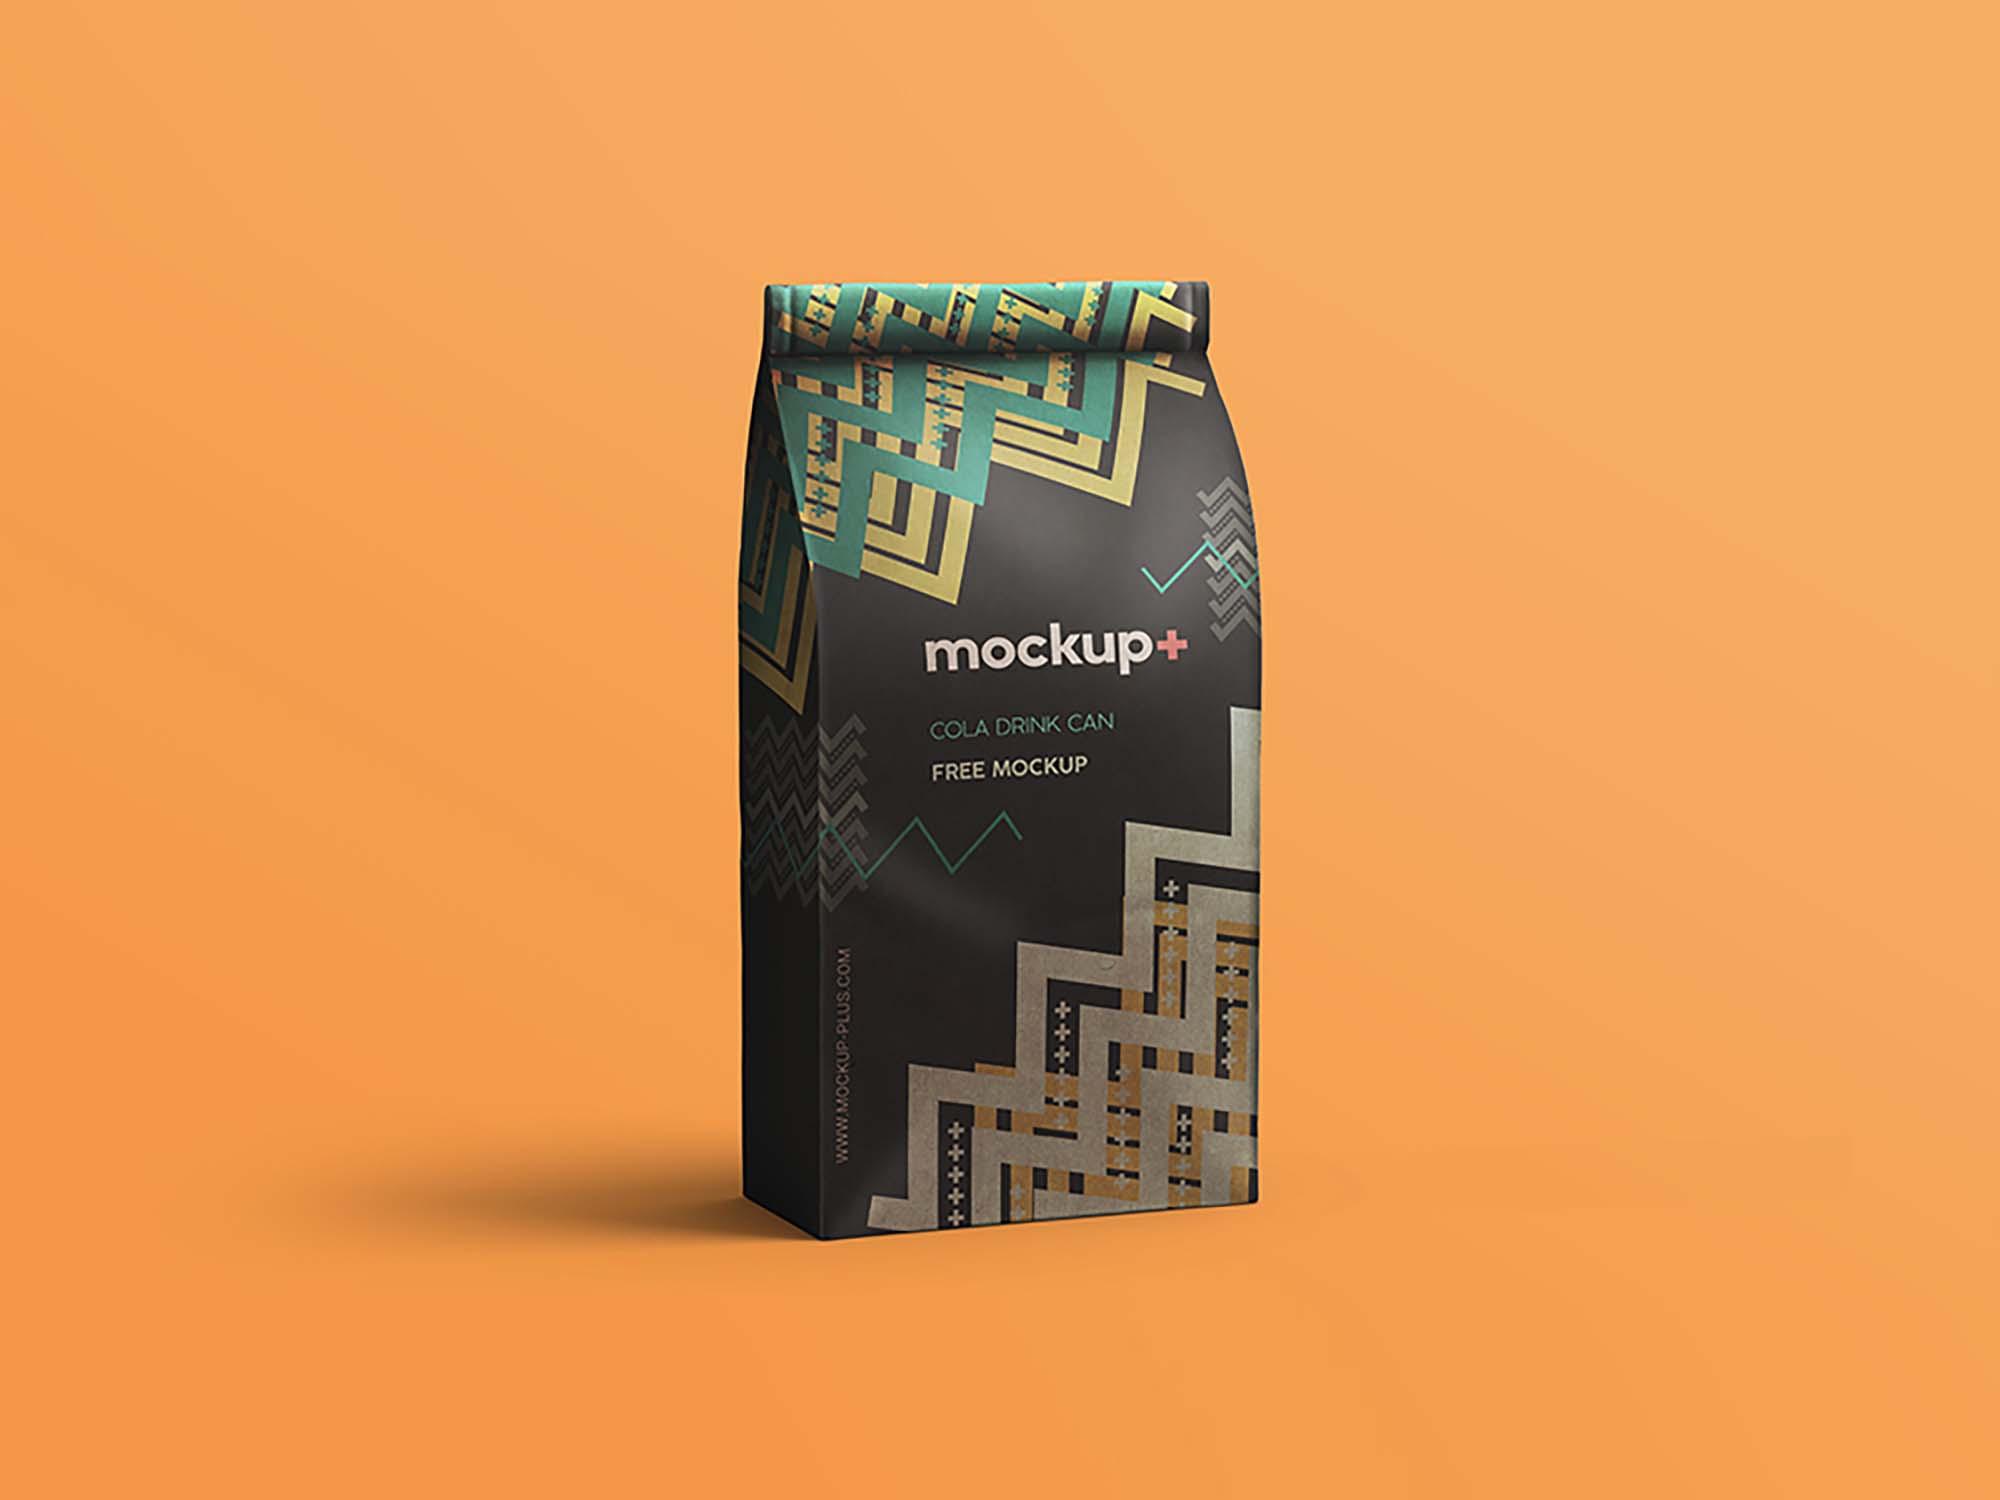 Get this great food bag mockup now! Free Coffee Bag Mockup Psd